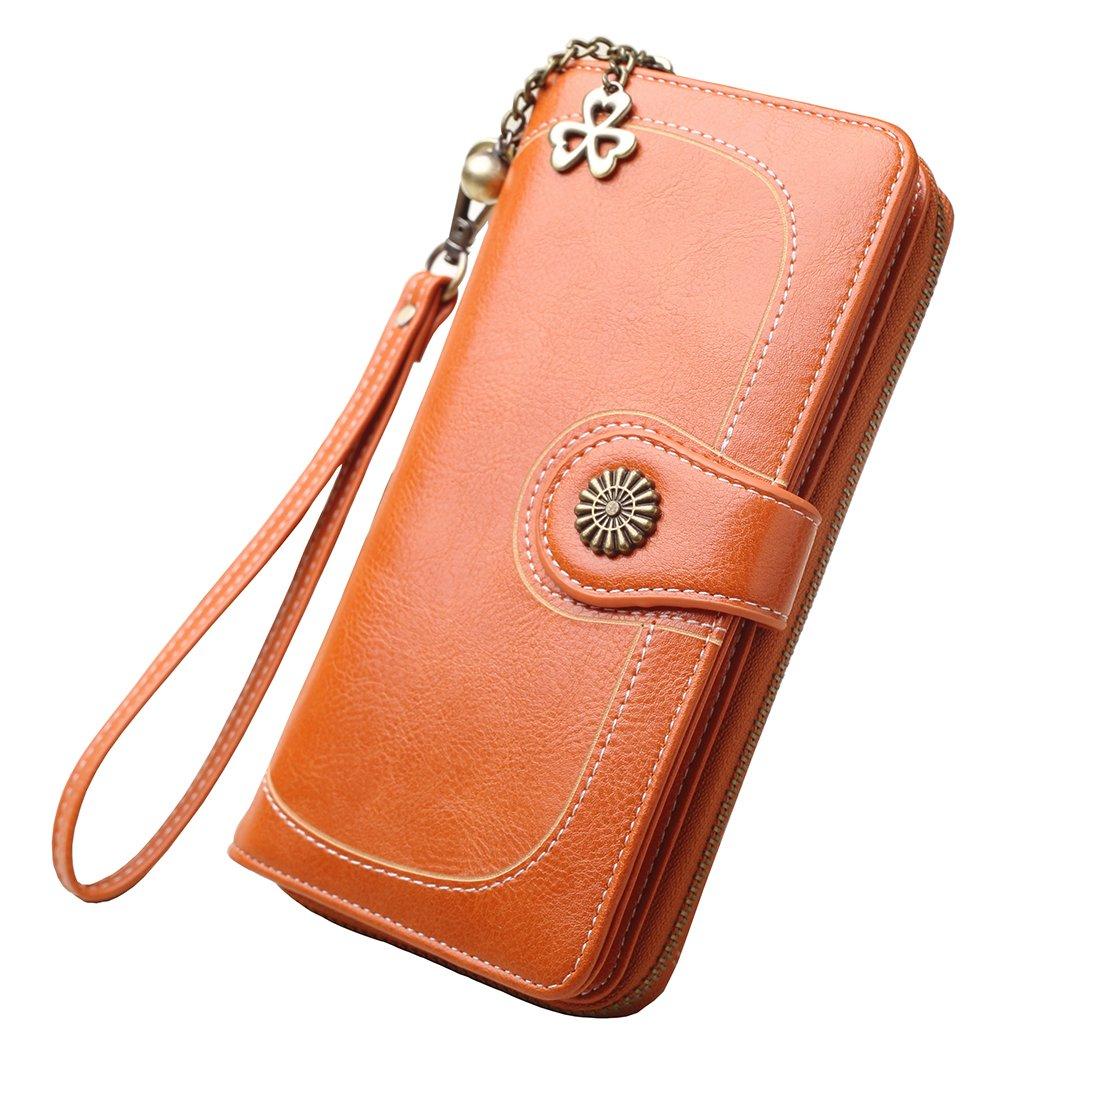 Women's Credit Card Holder RFID Blocking Zipper Wallet,Large Capacity Wax Purse,Orange